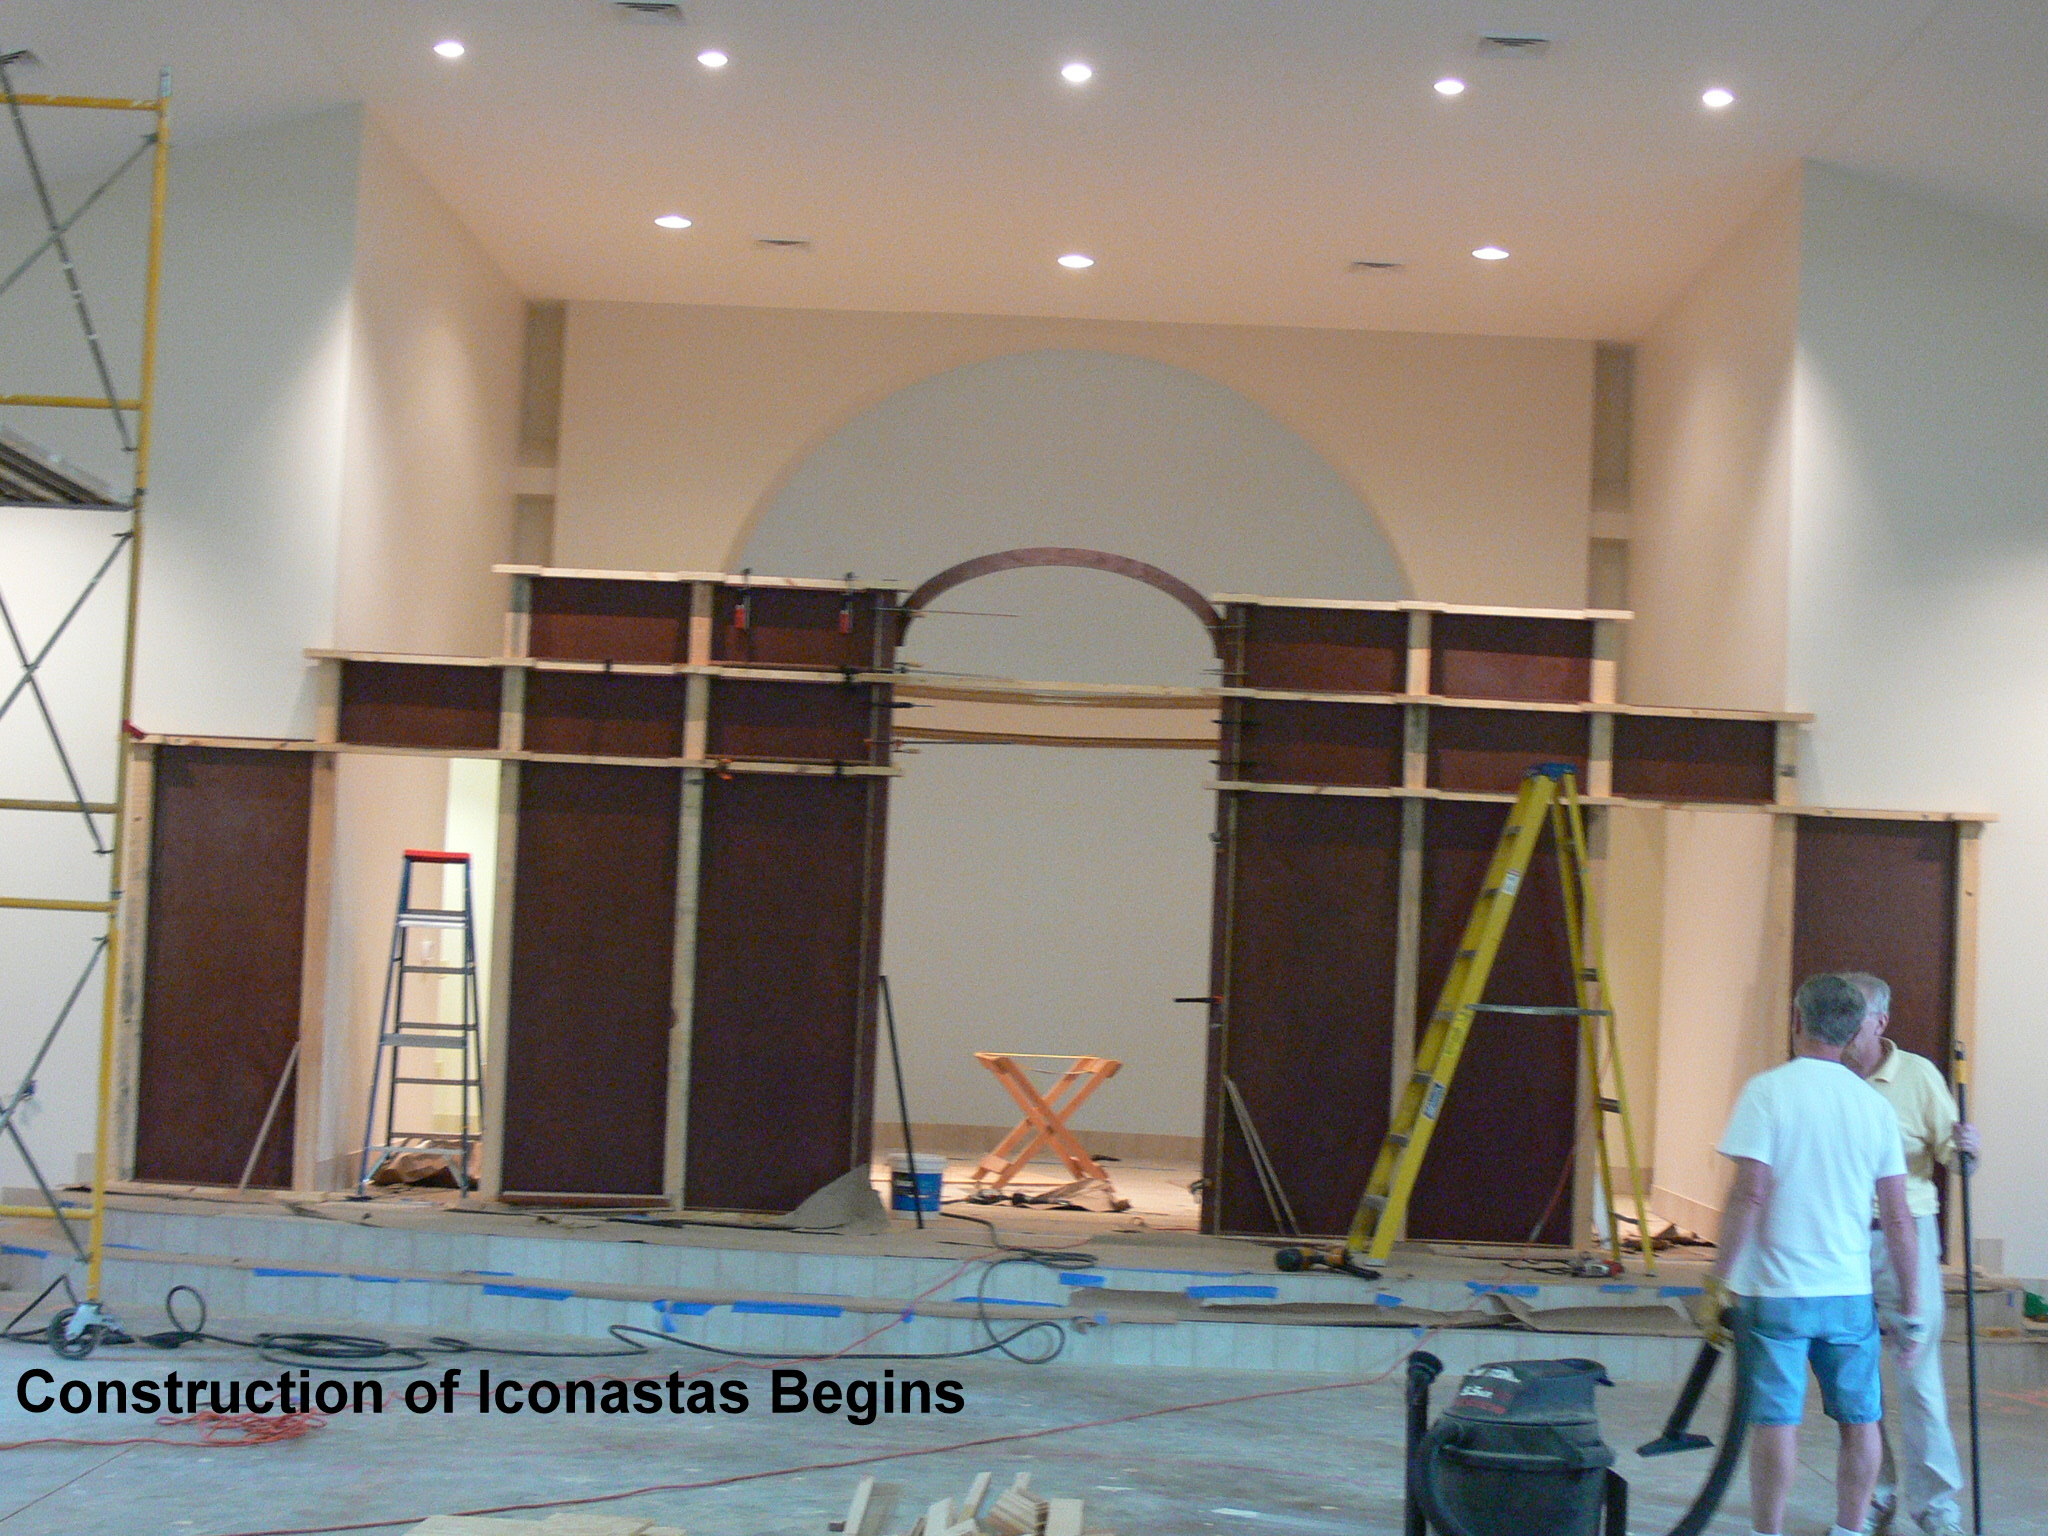 2-iconastas-begins